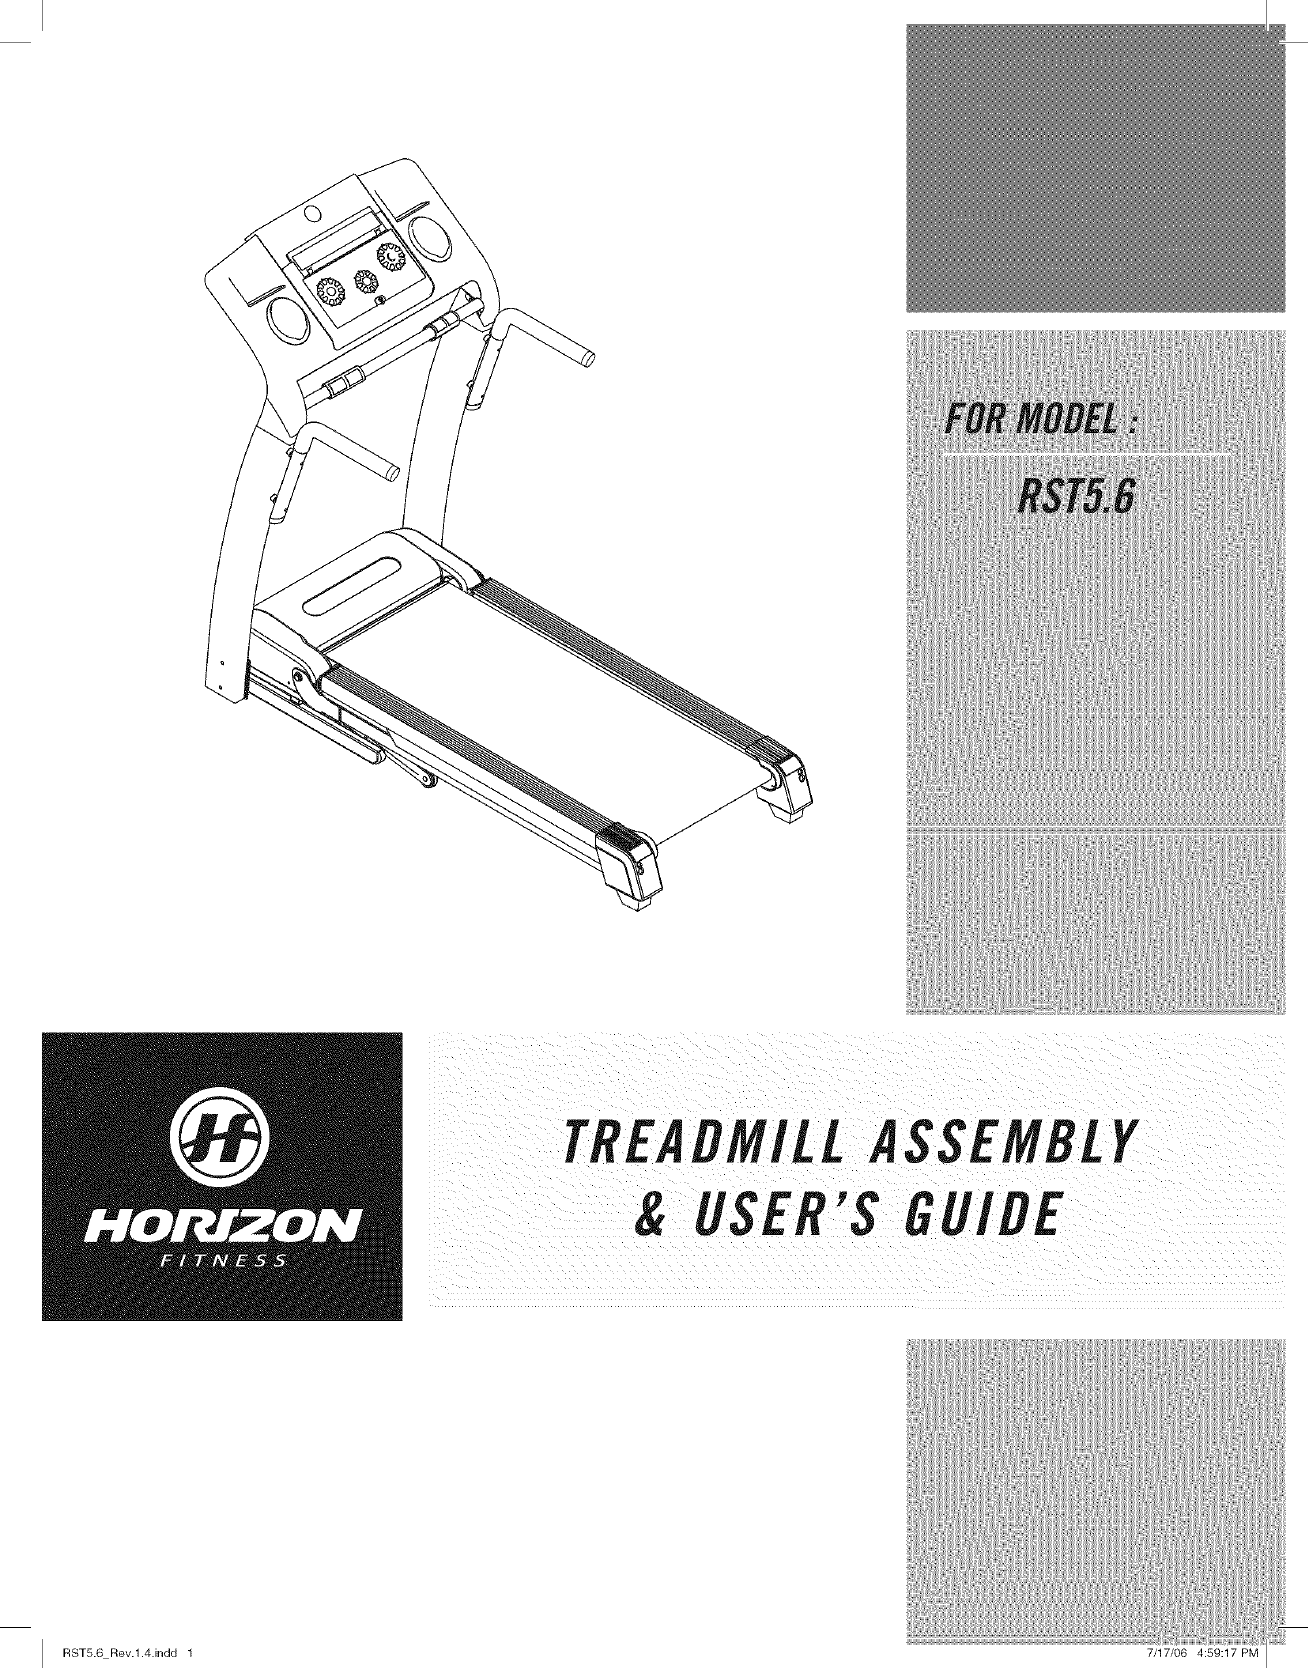 Washingtonpost Com Horizon Section Manual Guide